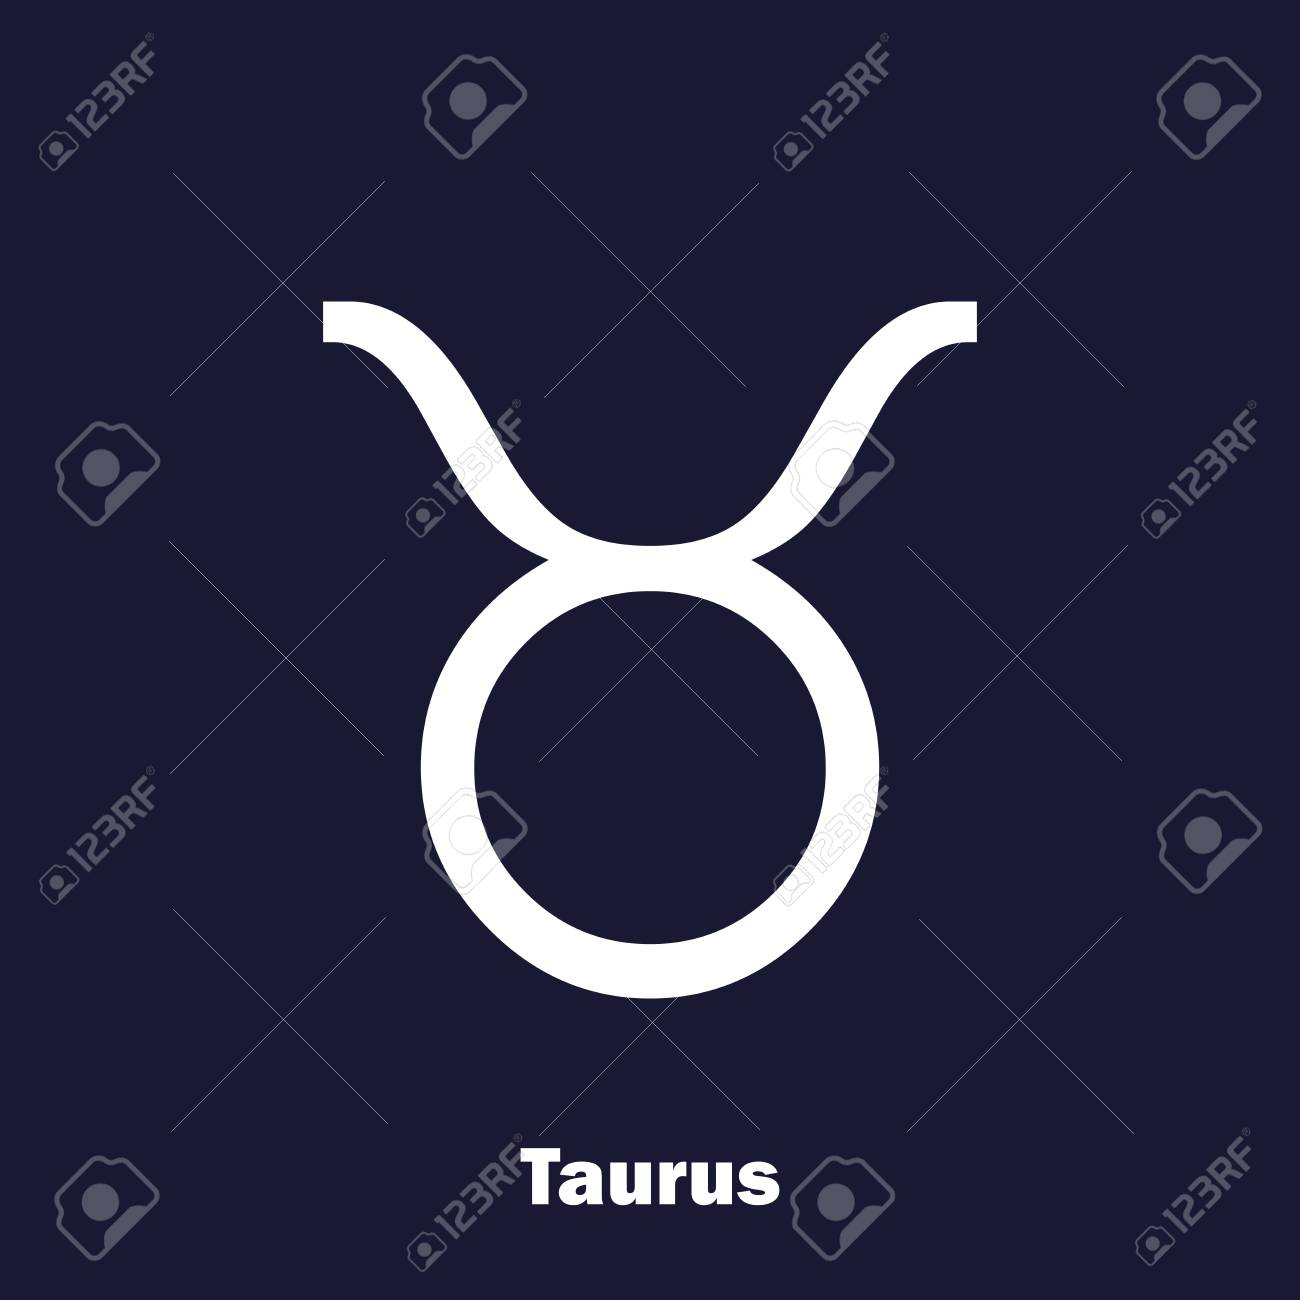 Taurus Zodiac Sign Astrological Symbol Royalty Free Cliparts